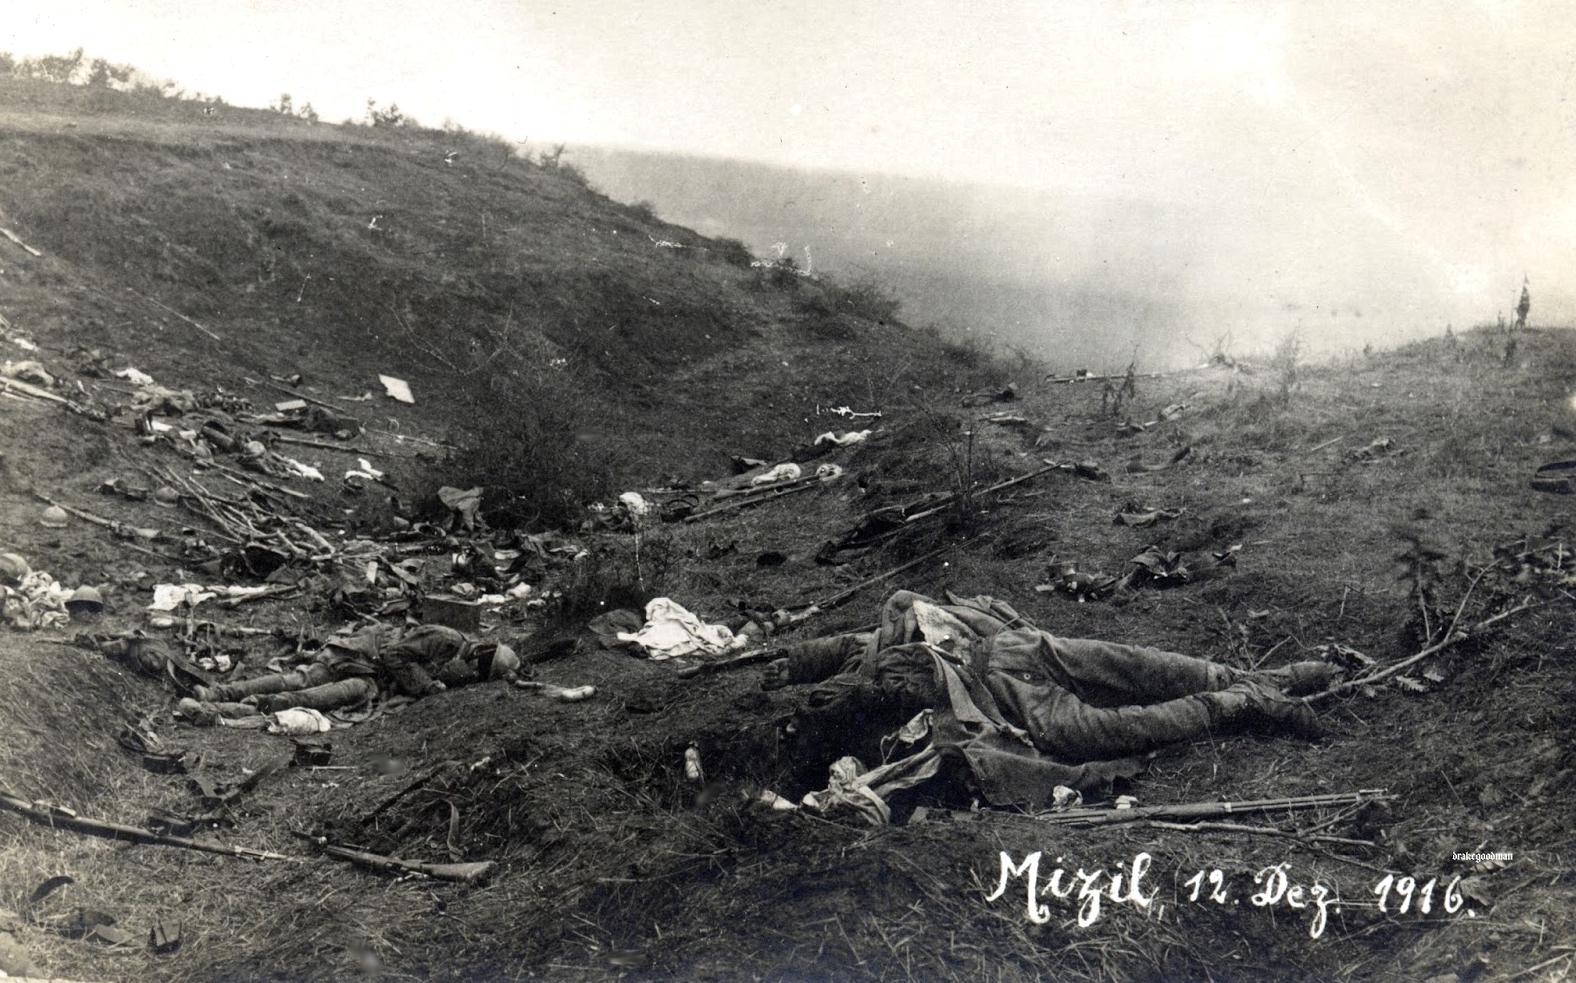 mizil-razboi-1916-dead-romanian-soldiers-world-war-one-ww1-romanians.jpg